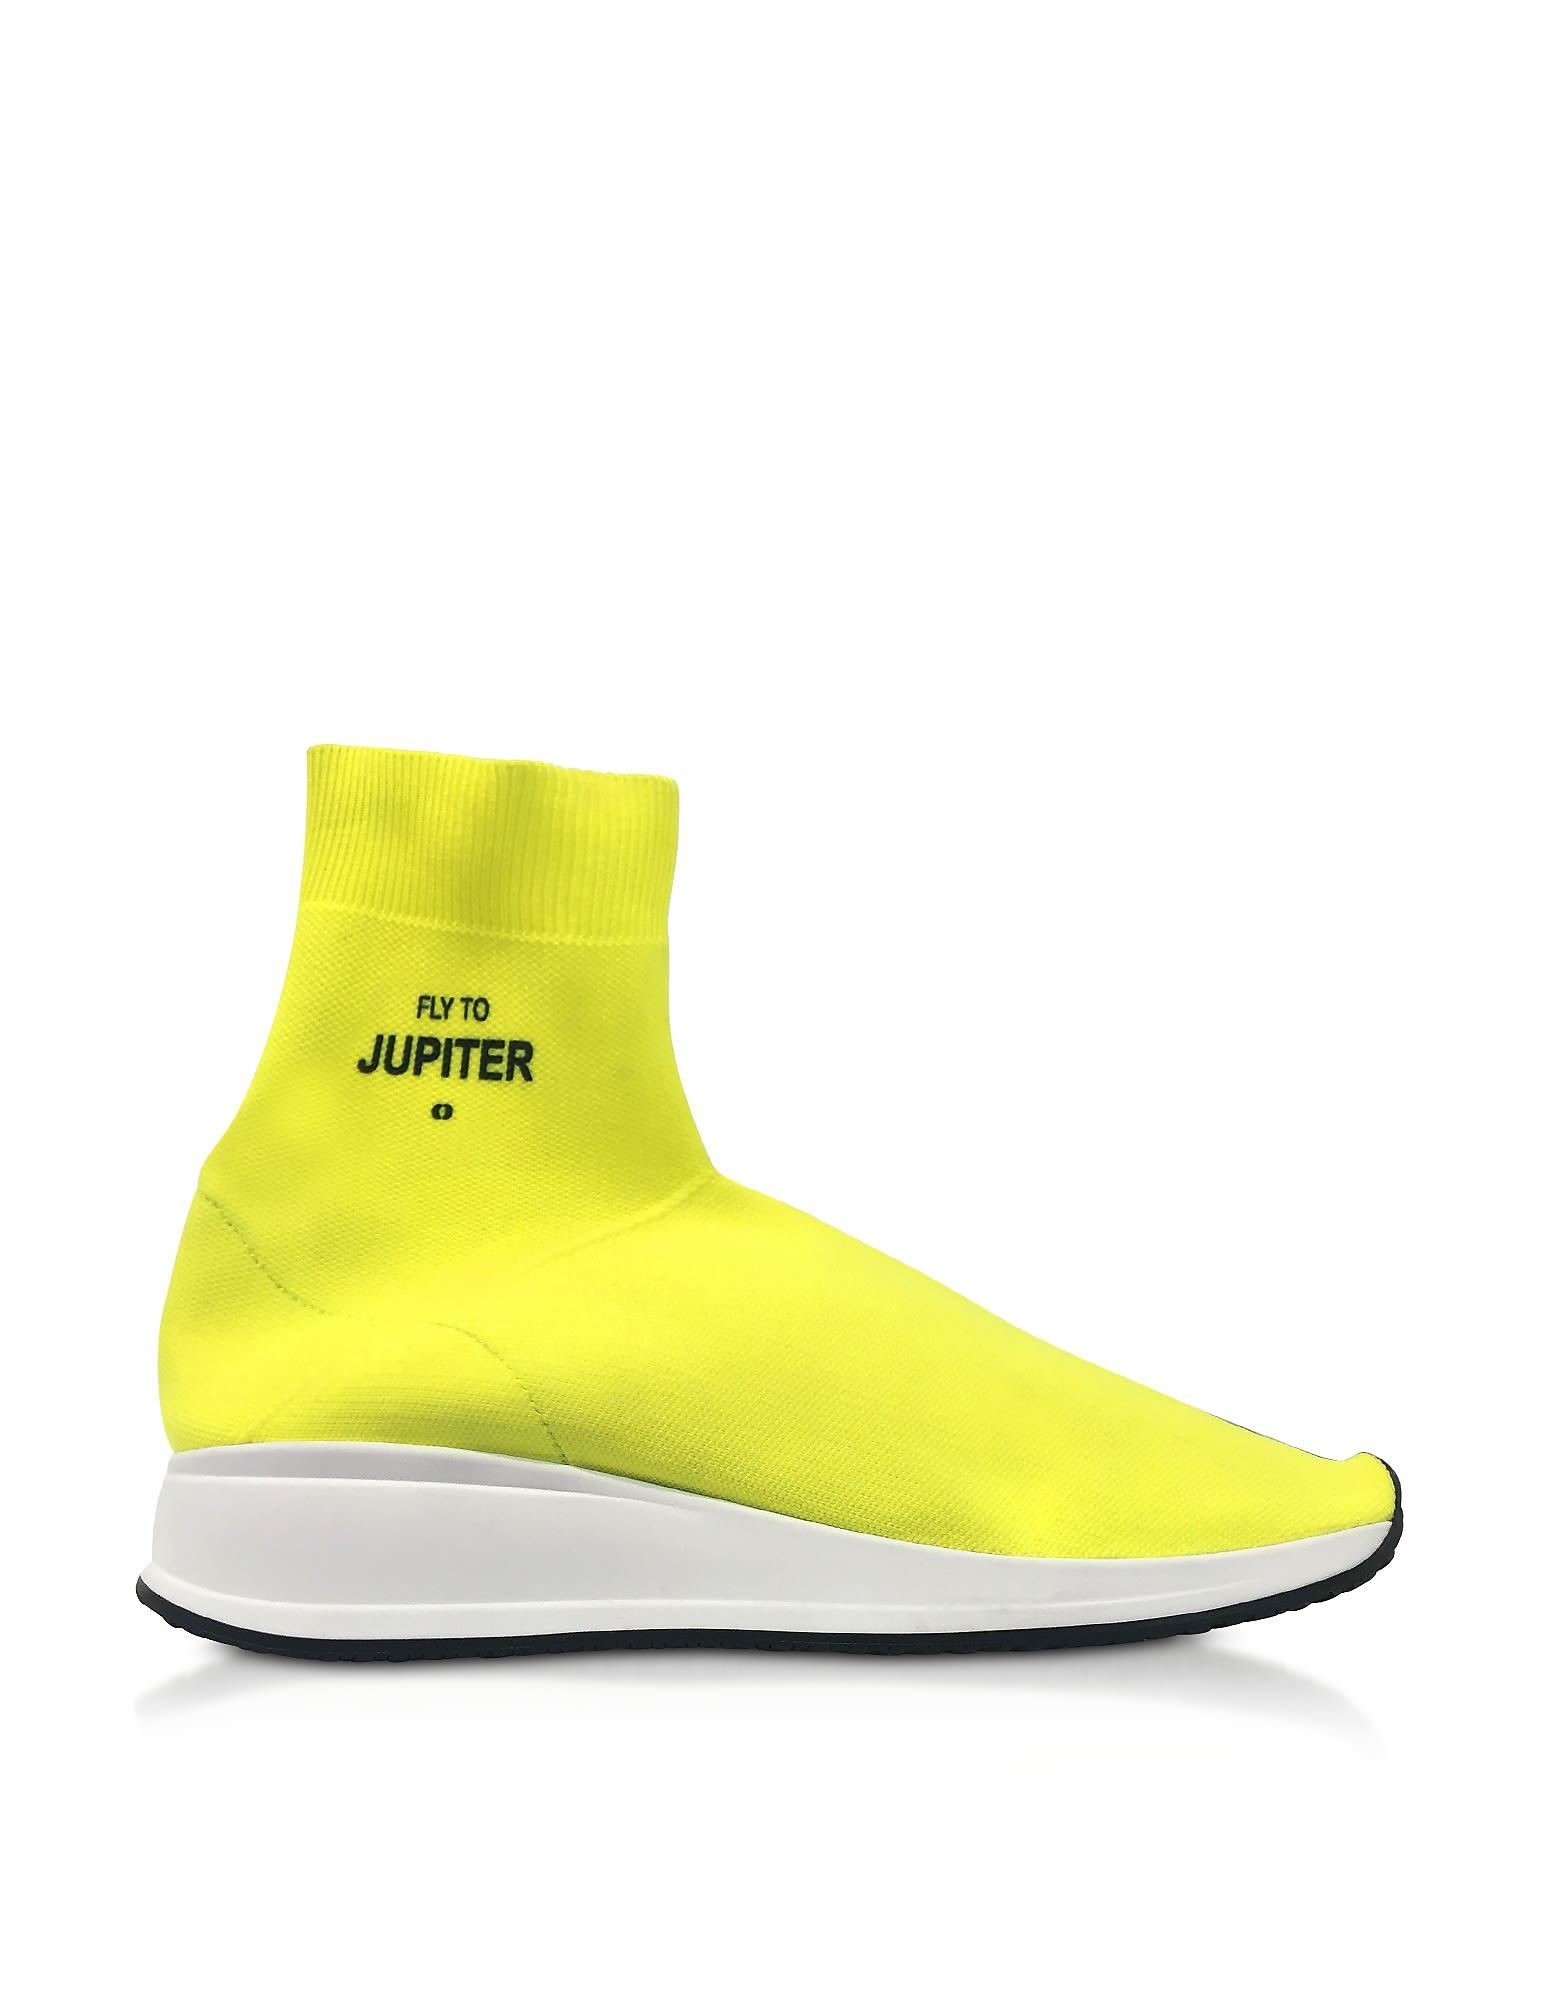 JOSHUA SANDERS Shoes, Fly To Mars Neon Nylon Sock Sneakers